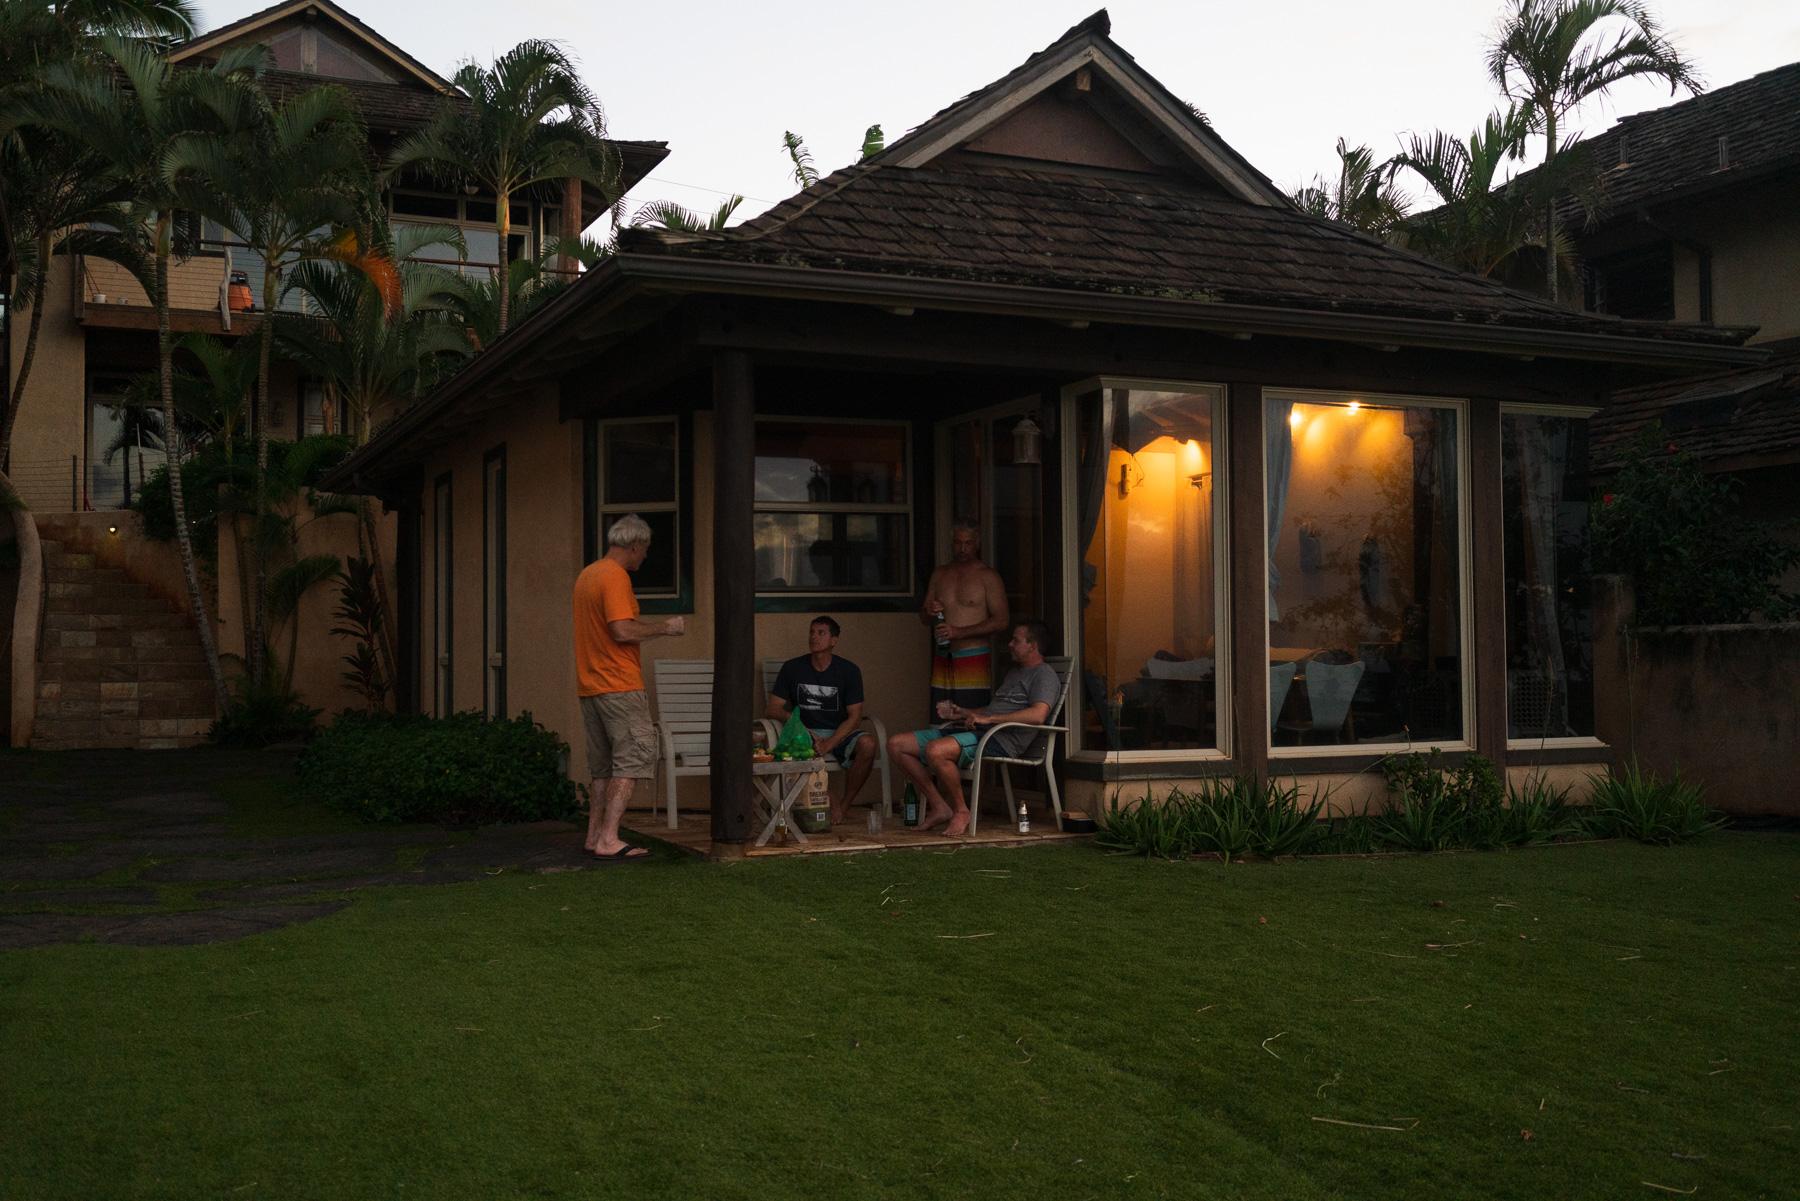 Maui-Trip-Kite-53.jpg